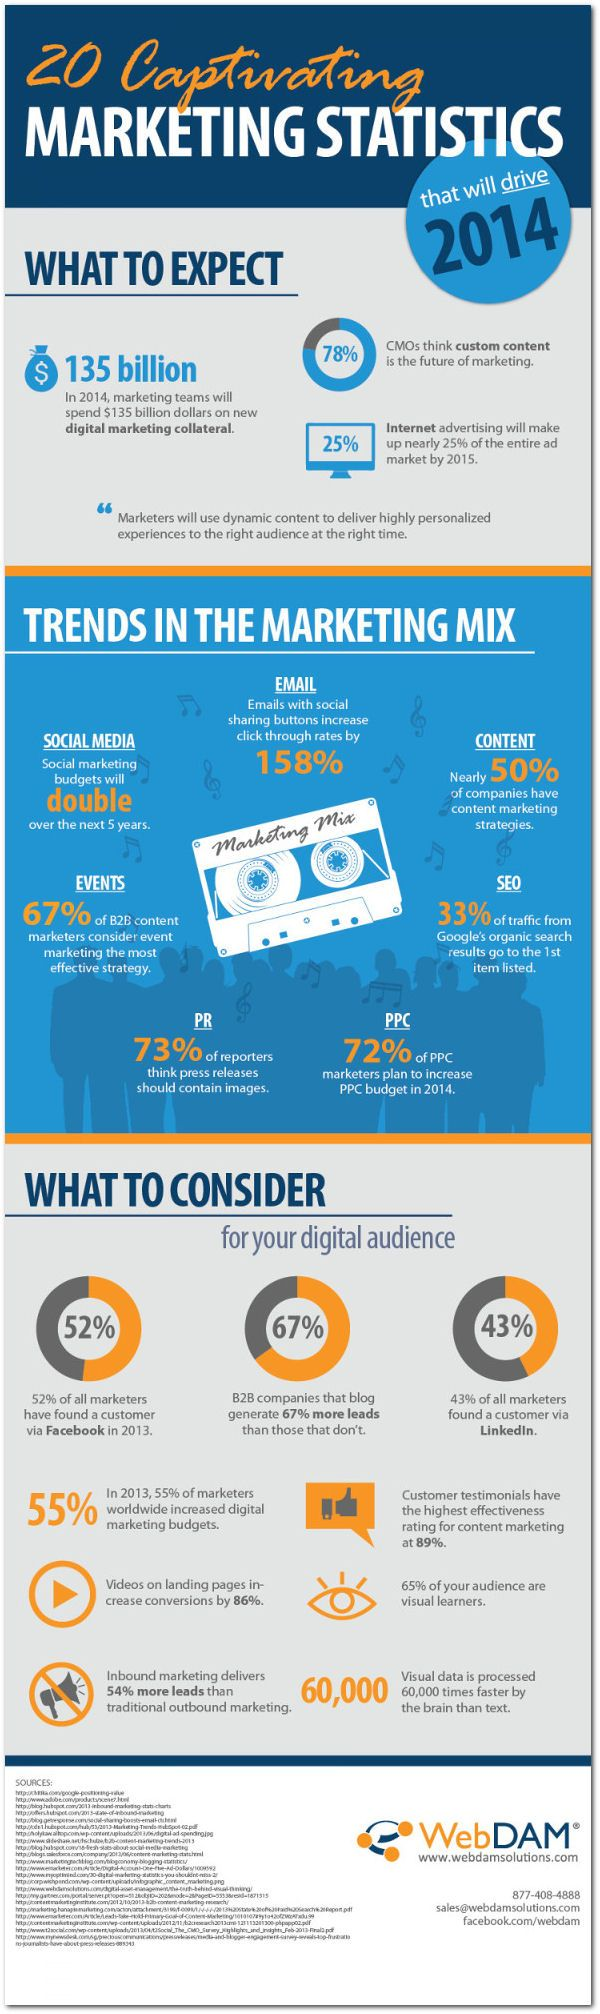 20 marketing statistics 2014 infographic 20 Statistics That Will Drive 2014 Marketing Strategies [Infographic]